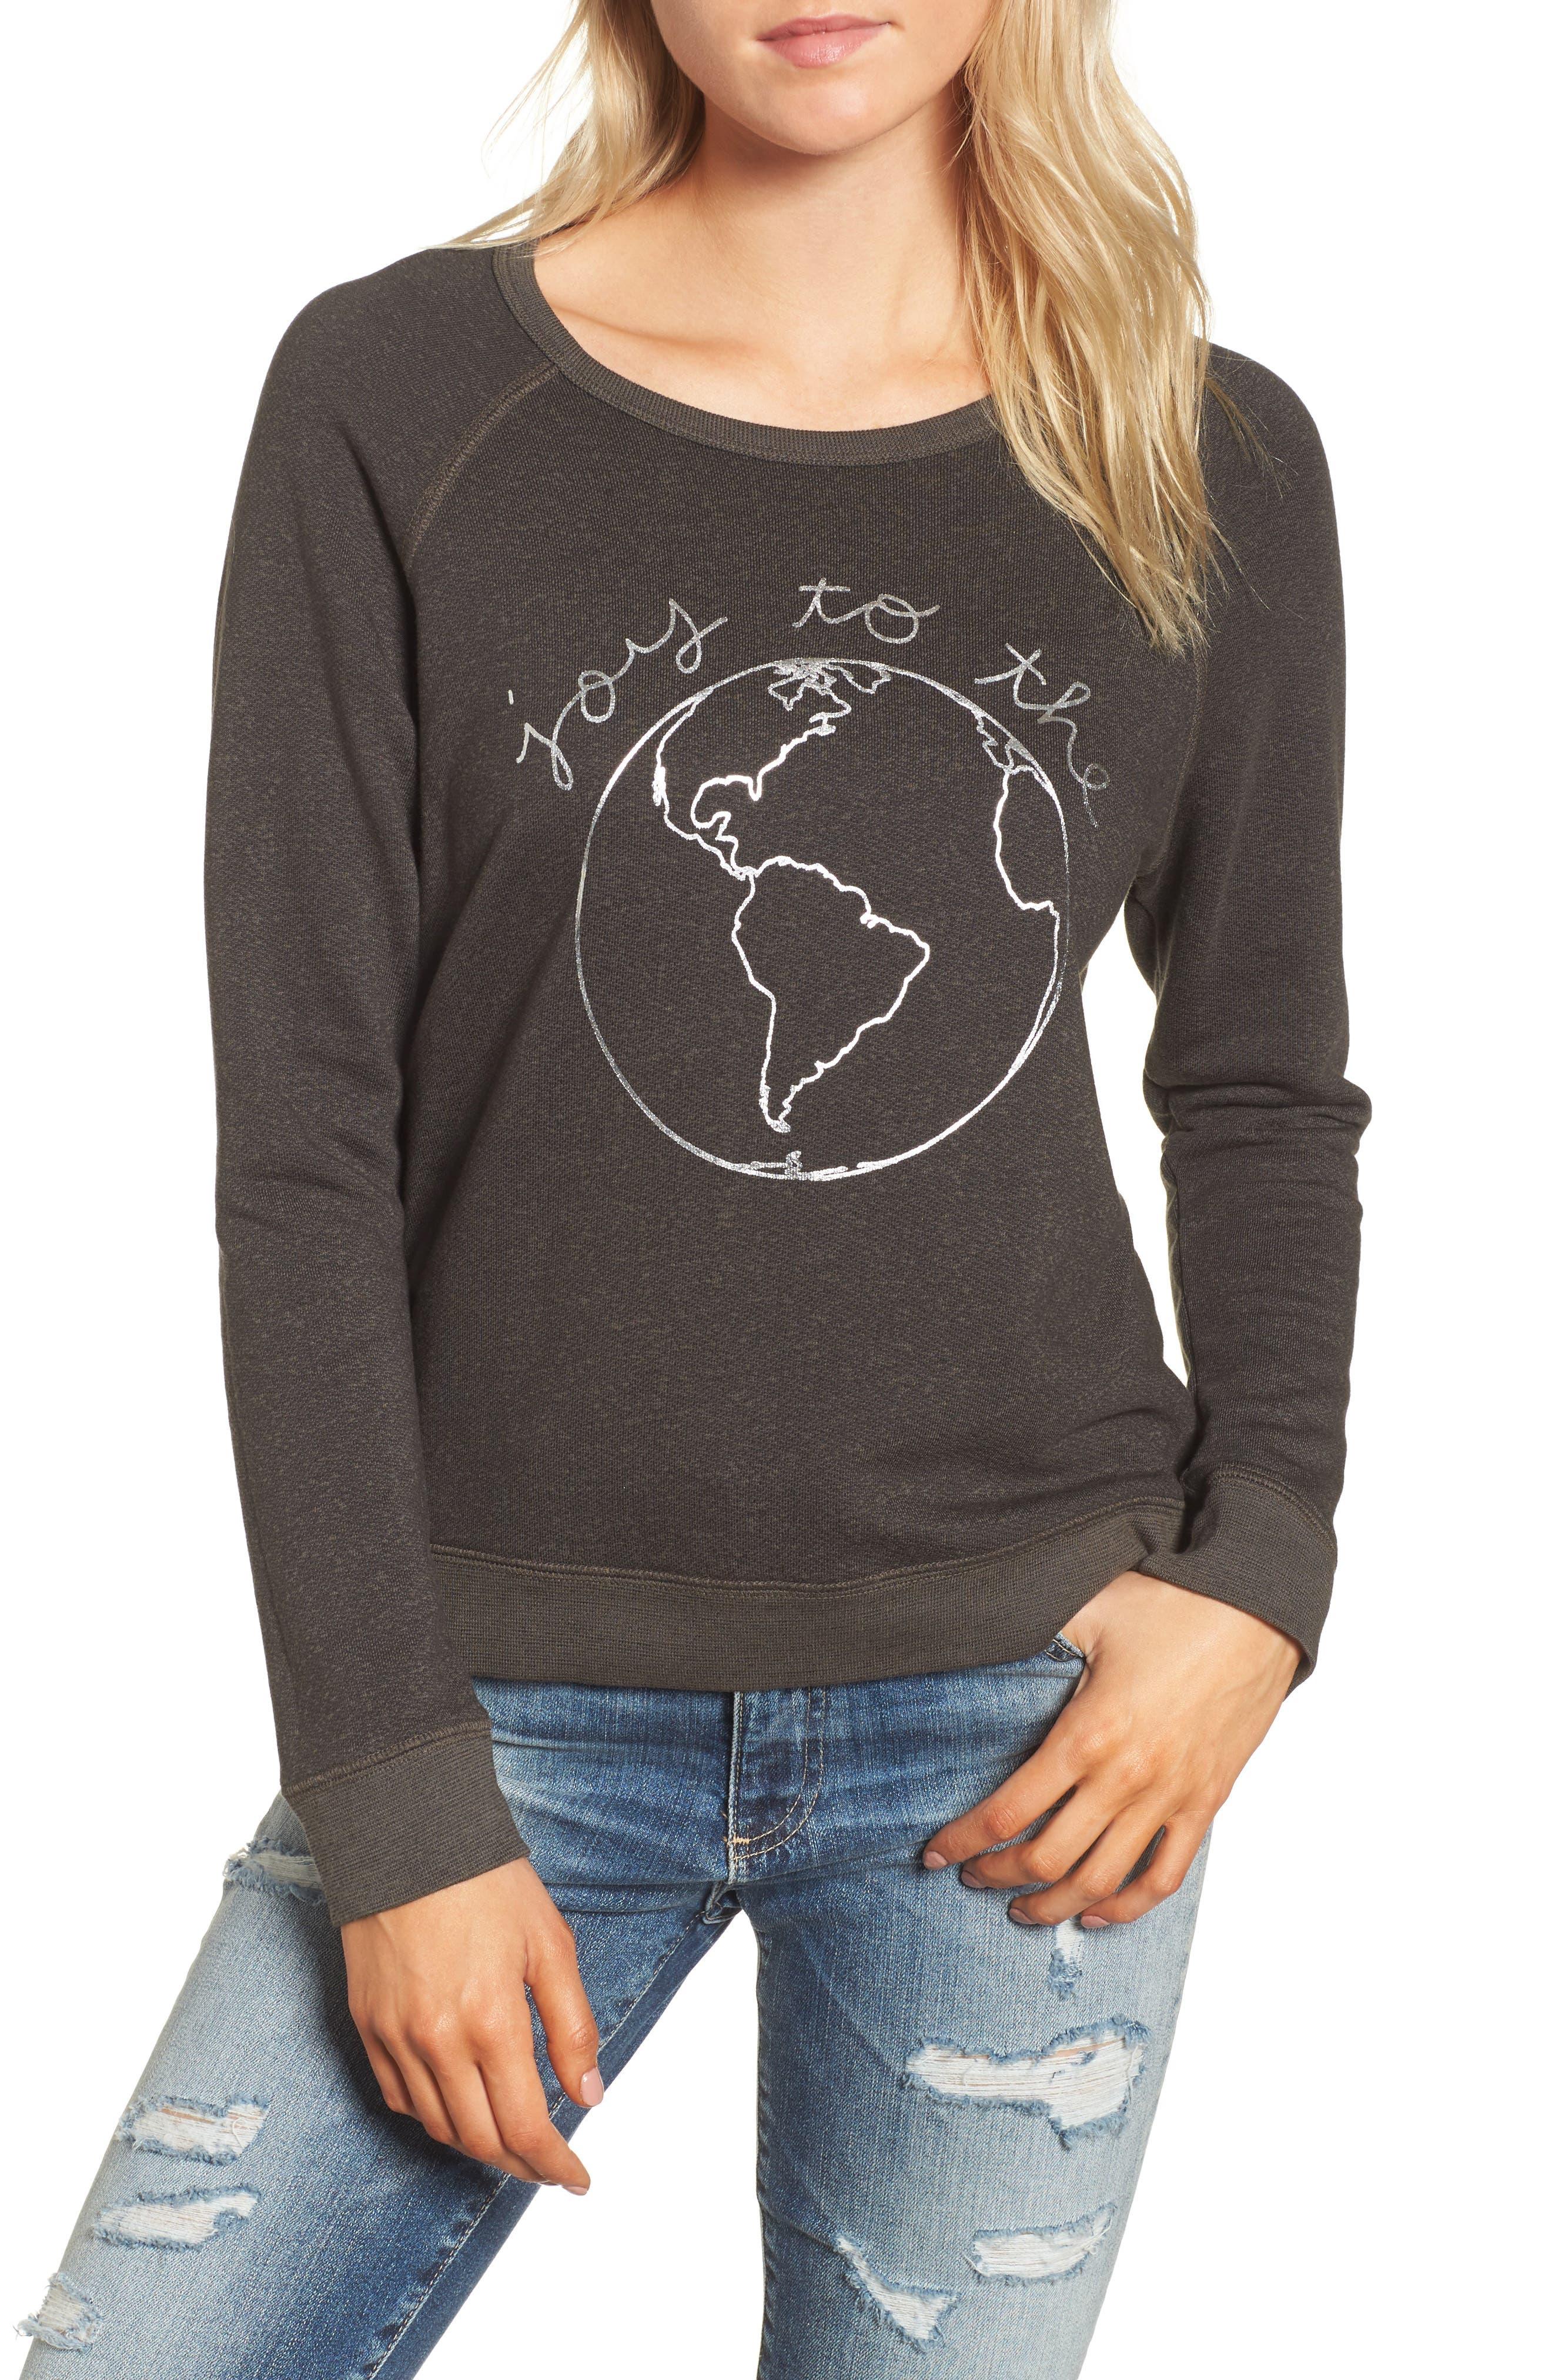 Joy to the World Sweatshirt,                             Main thumbnail 1, color,                             Black